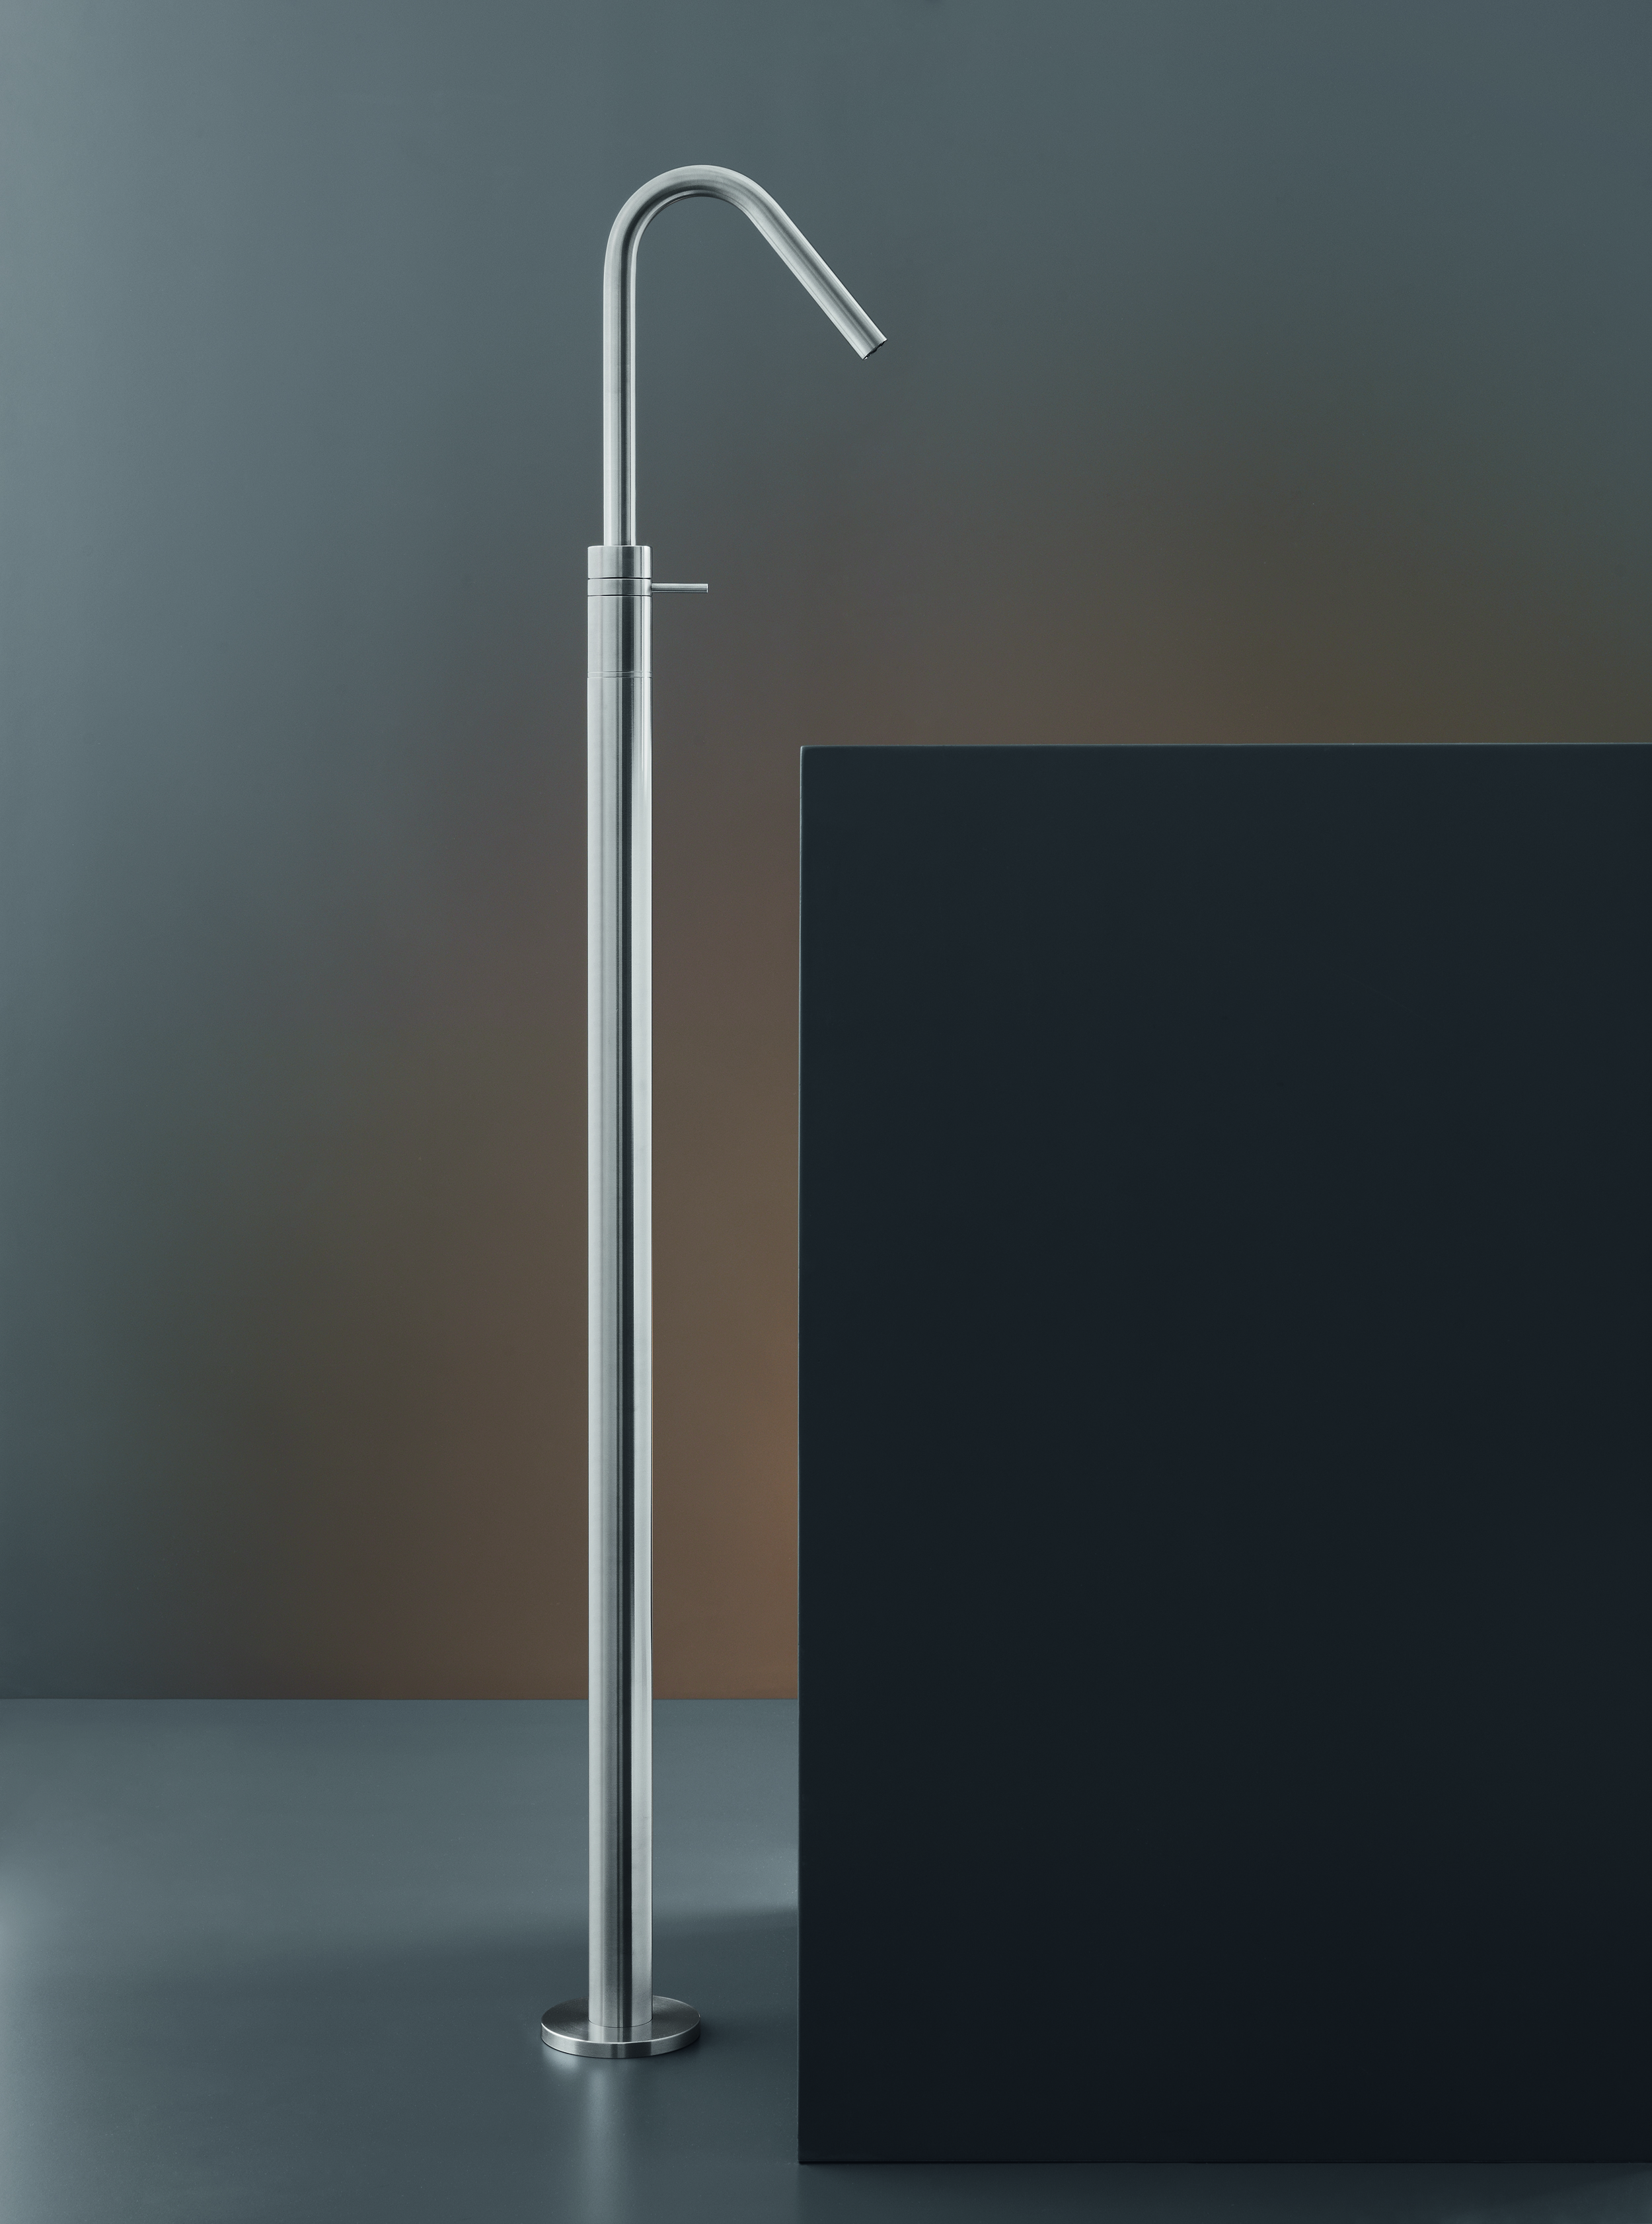 Contemporary Gradi Freestanding Faucet